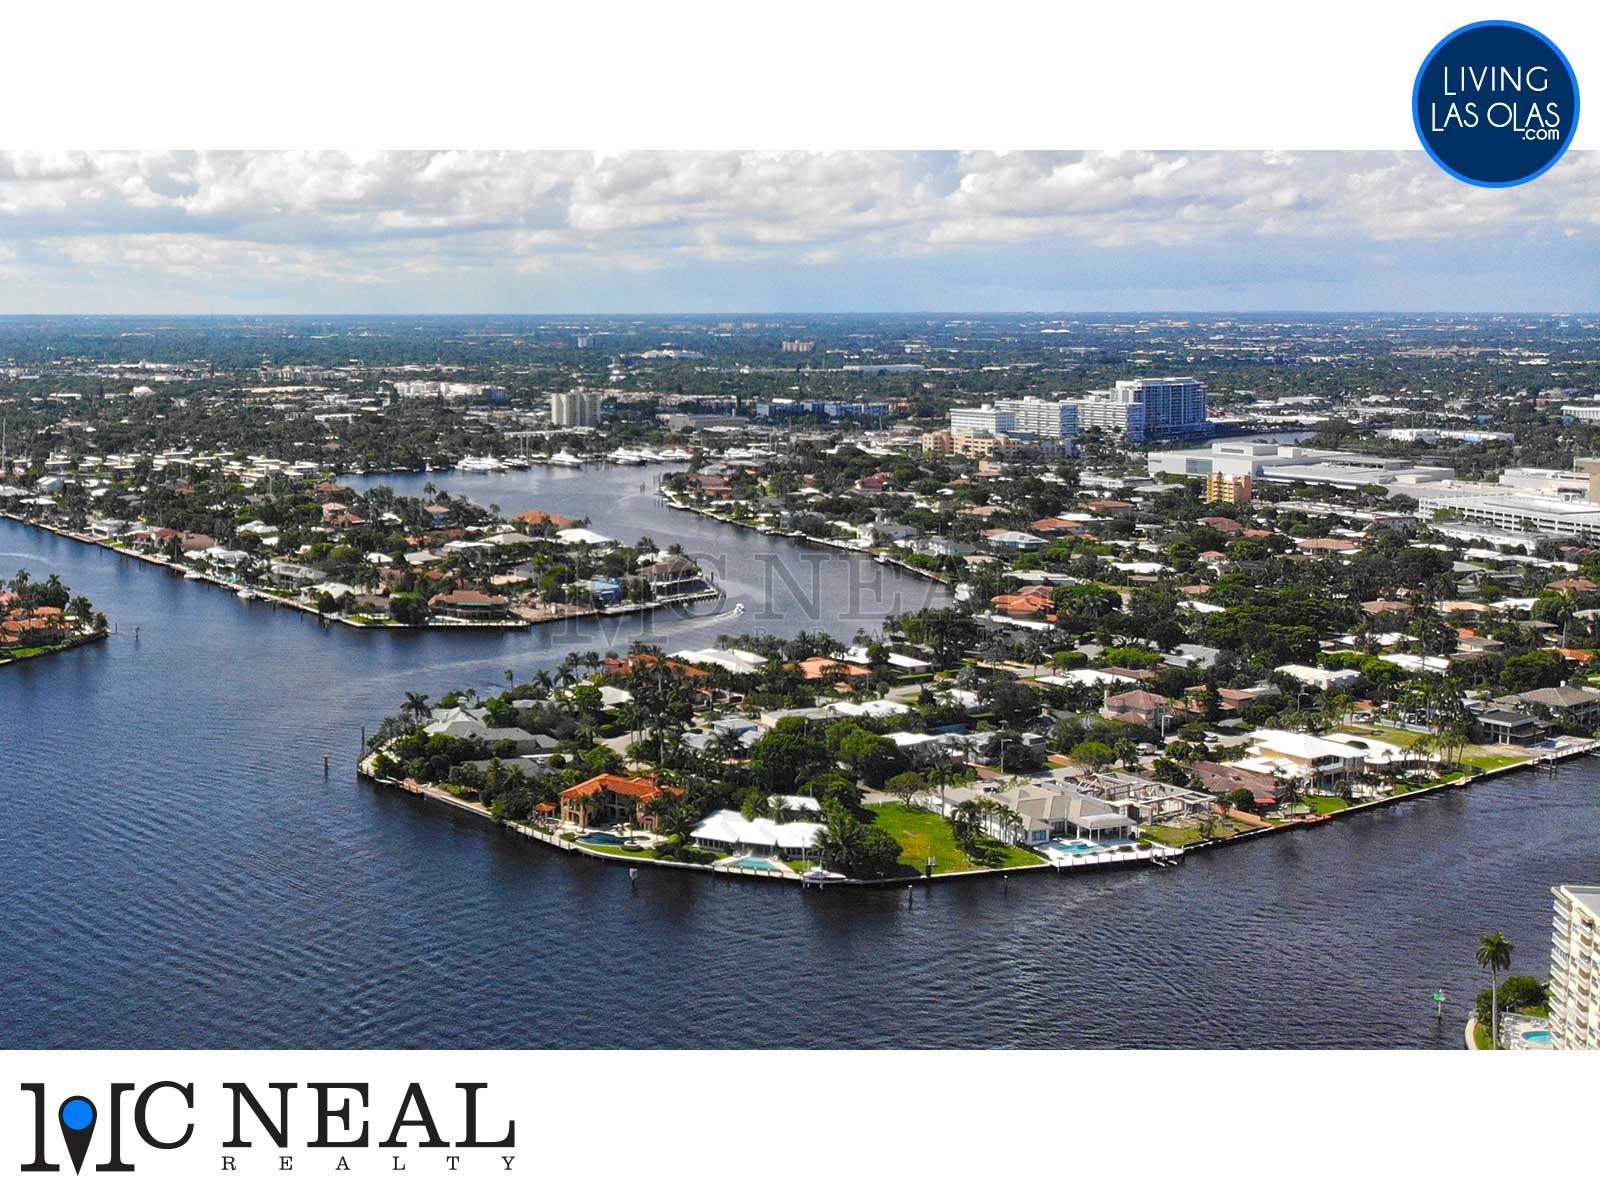 Sunrise Neighborhood Fort Lauderdale Homes Real Estate 02